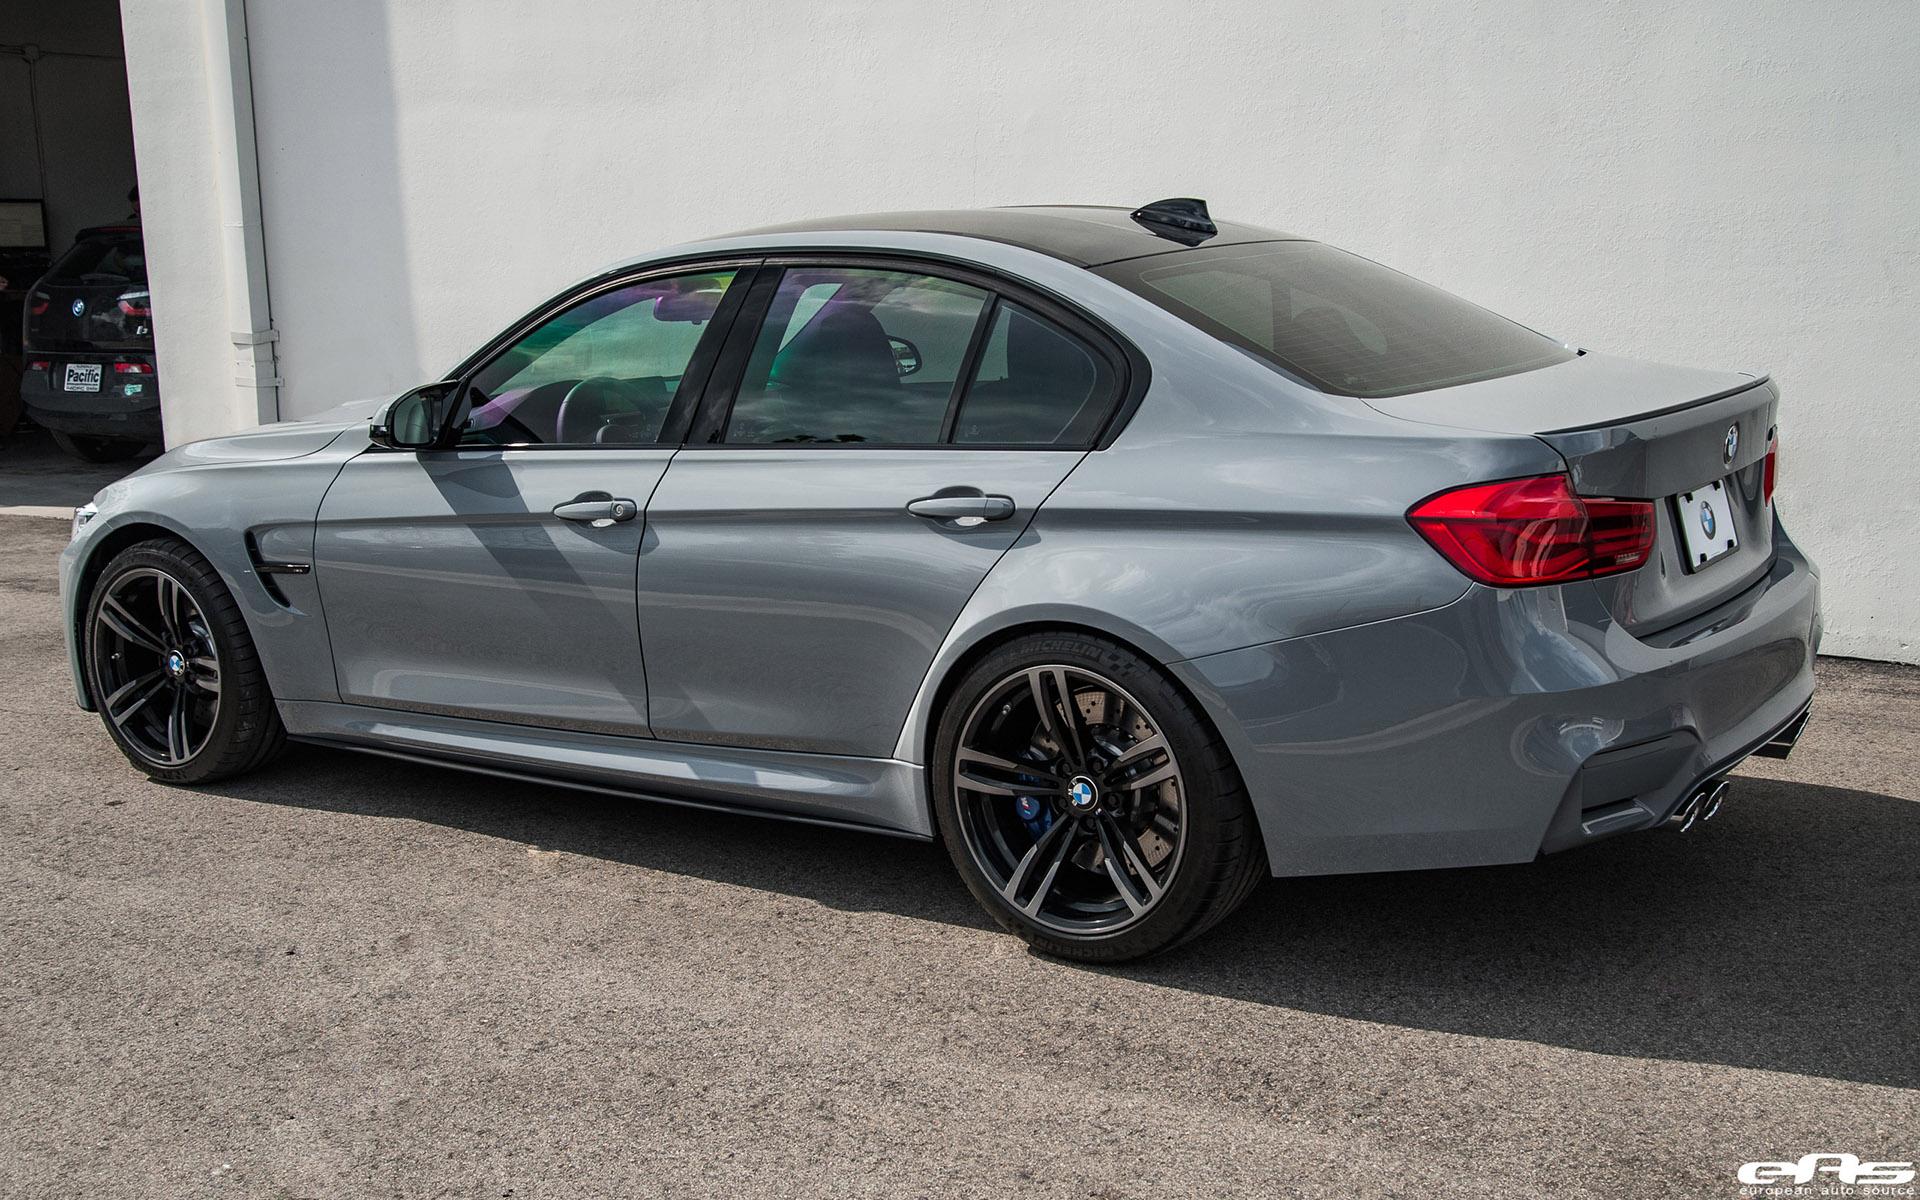 Bmw Aftermarket Parts >> Nardo Gray BMW F80 M3 Gets Aftermarket Upgrades